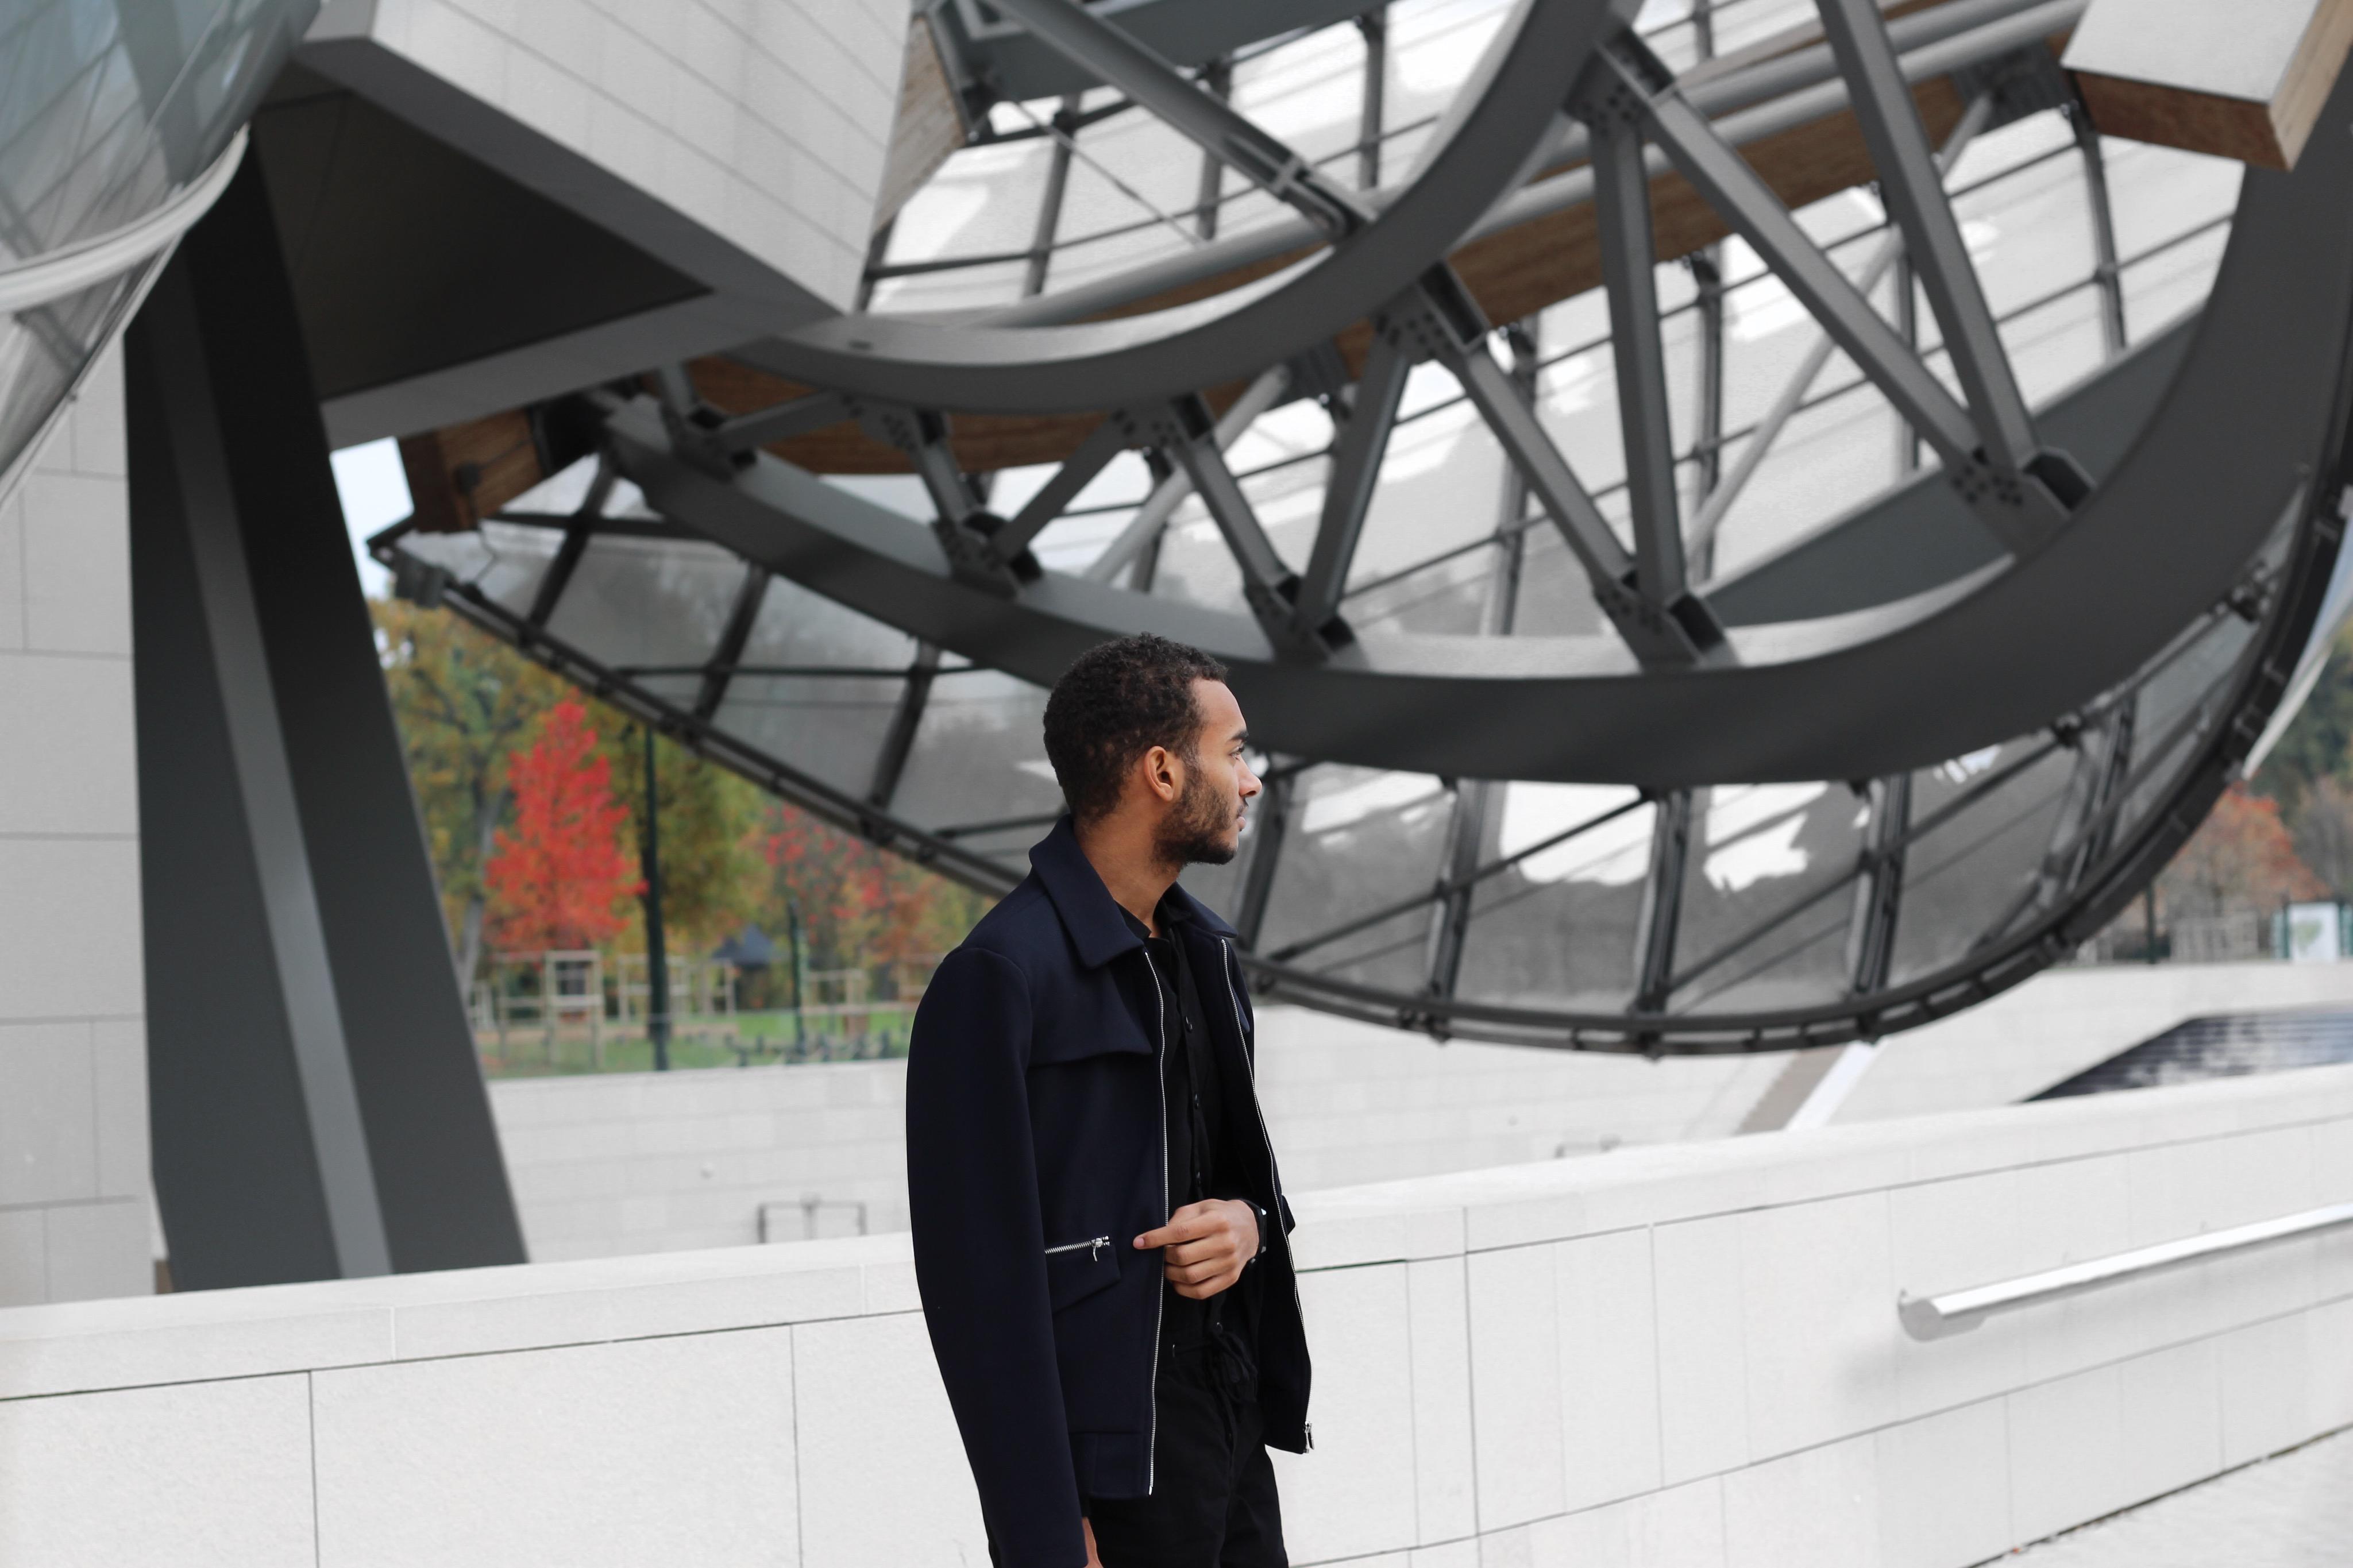 mrfoures-zara-jacket-veste-zara-asos-combinaison-blogueur-homme-blog-mode-homme-paris